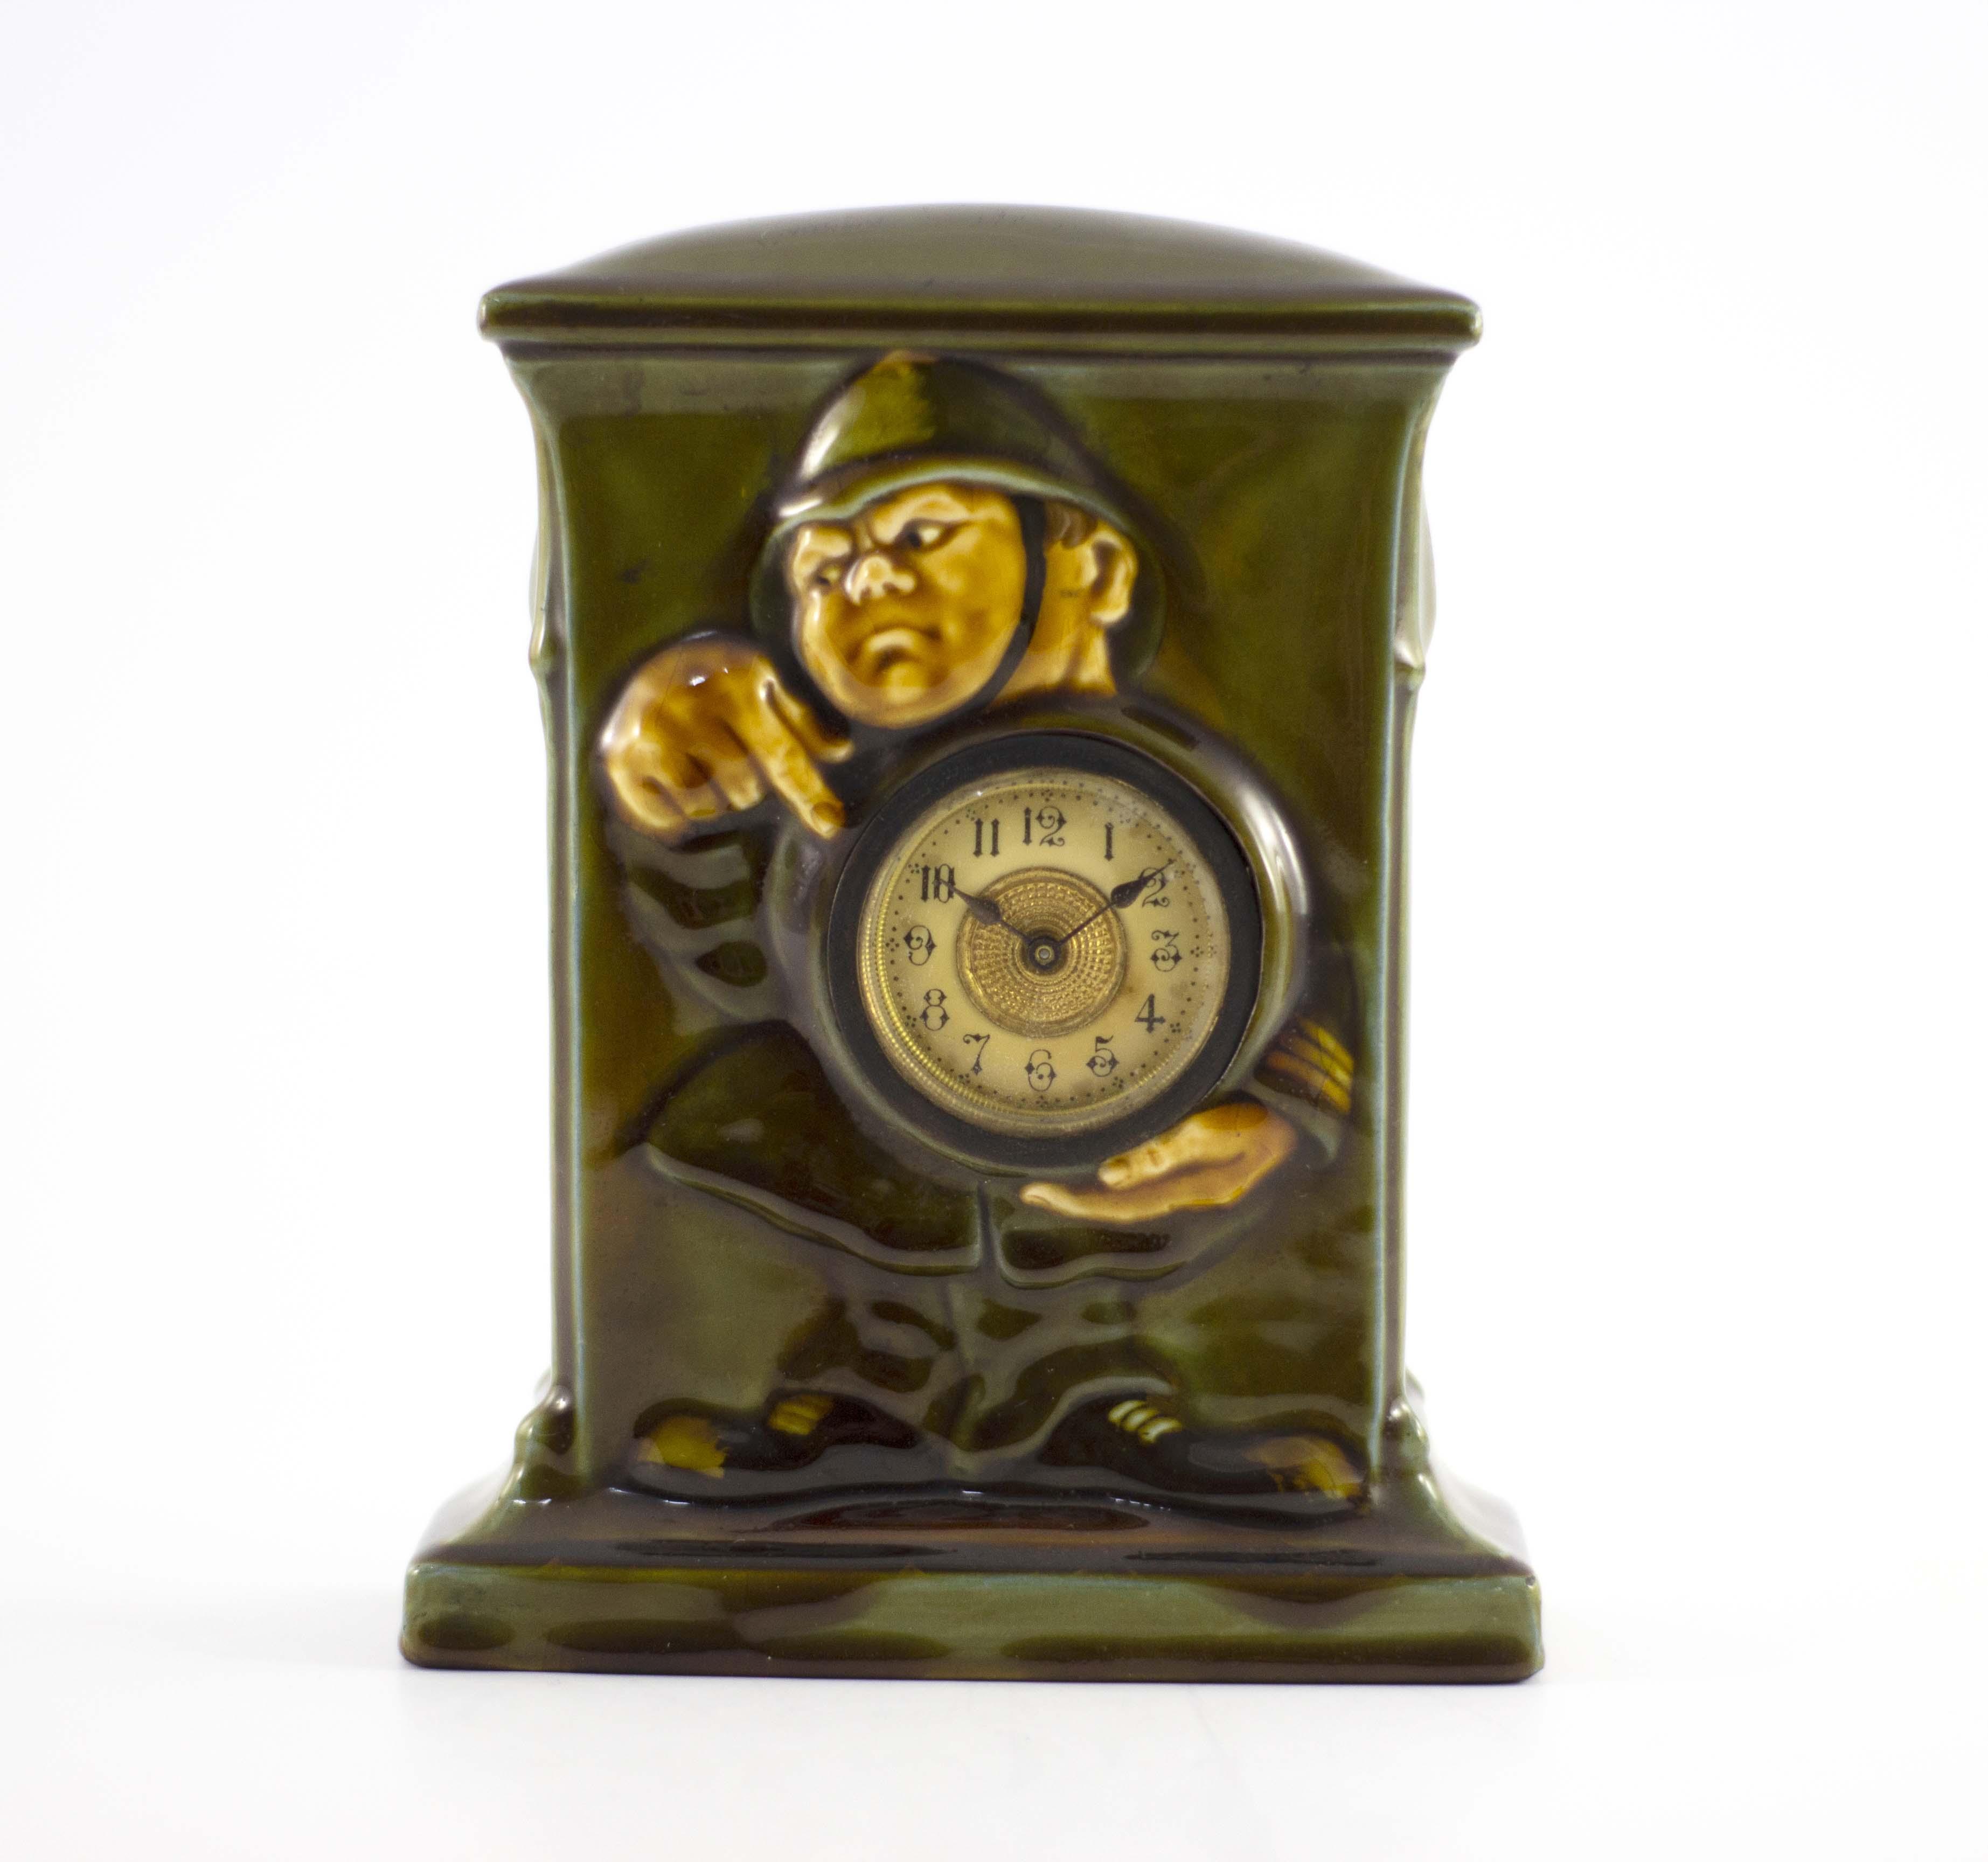 Charles Noke for Royal Doulton, a green Kingsware - Image 2 of 7